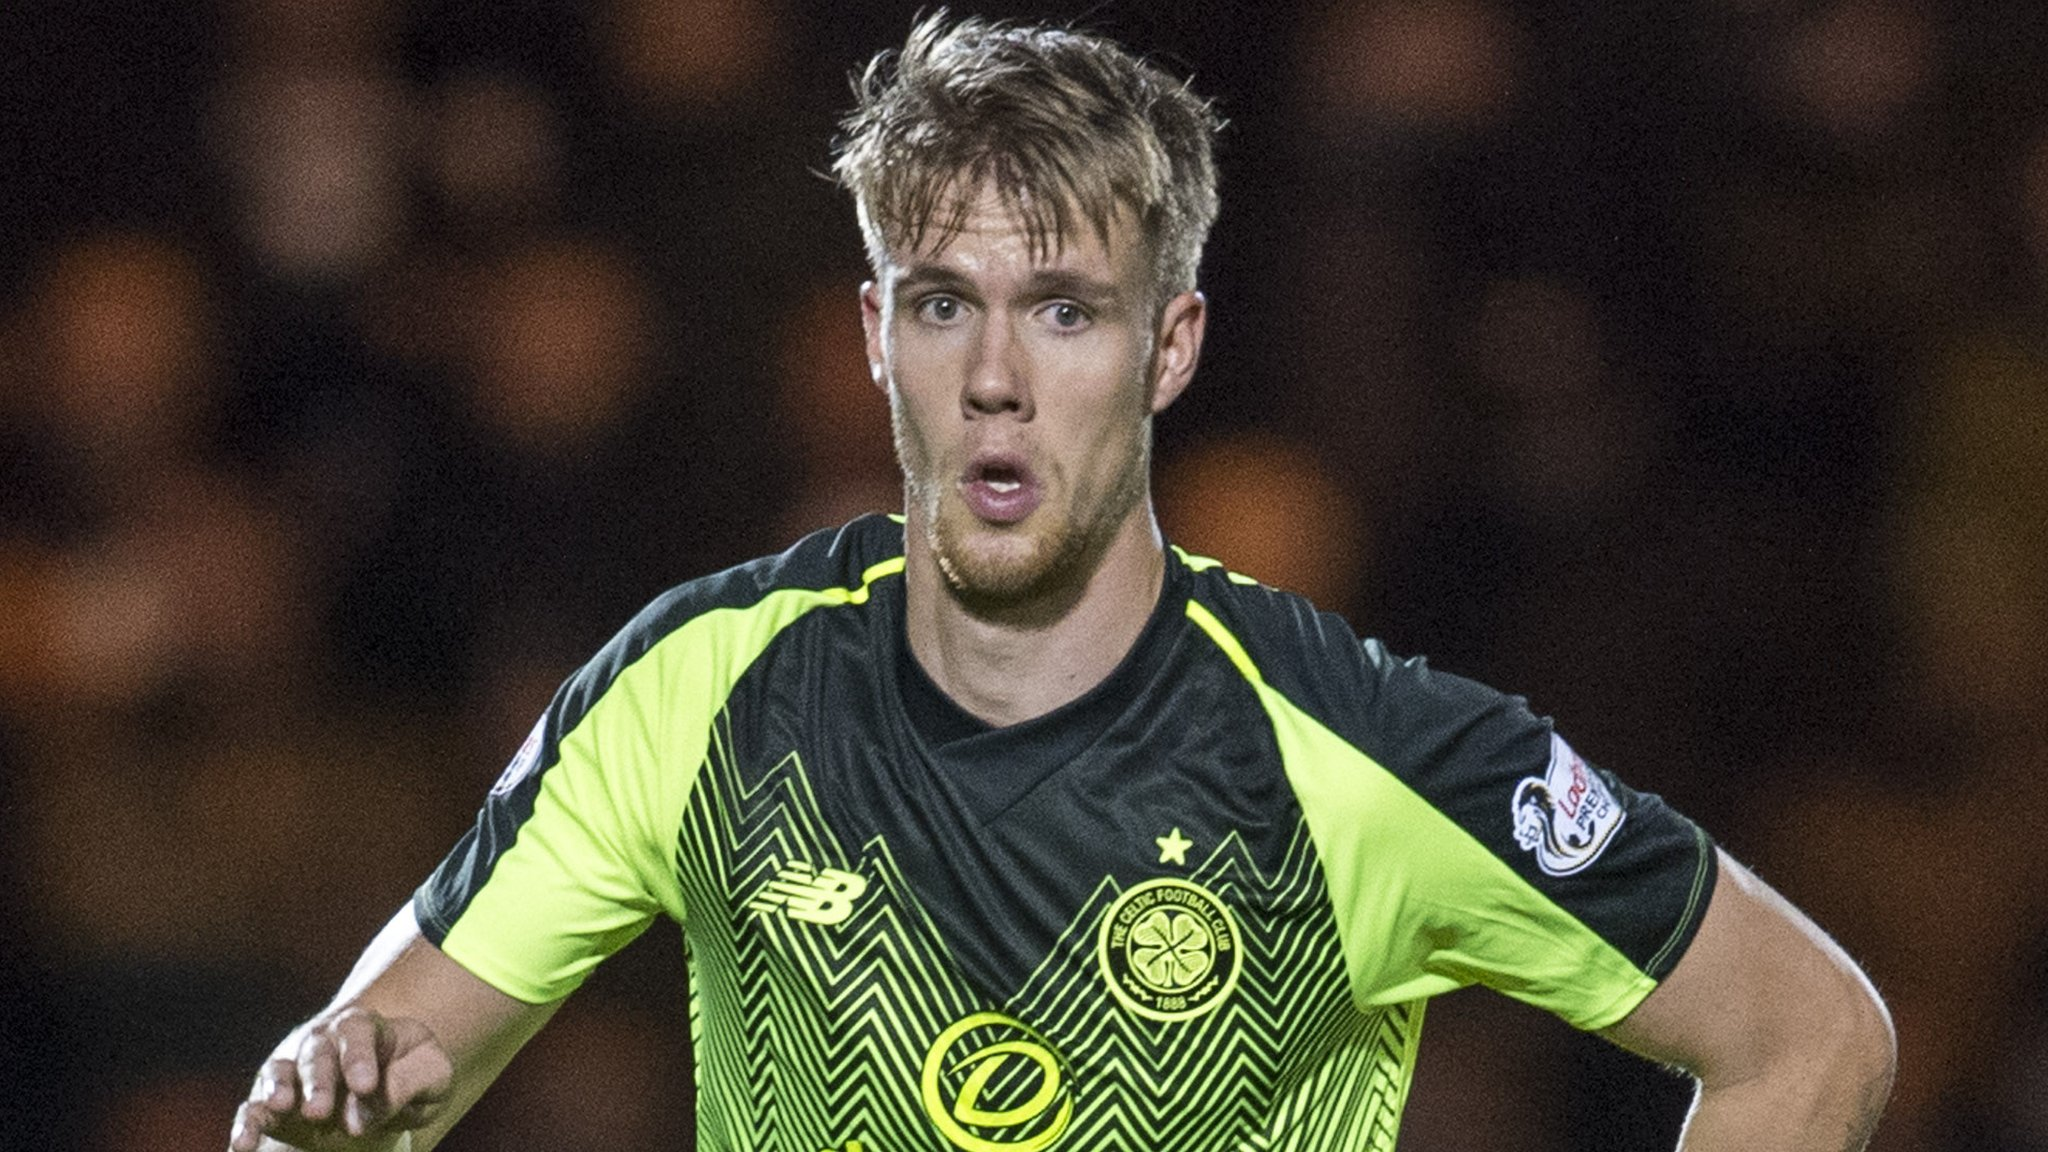 Ajer doubtful - Celtic v Rosenborg preview & pick your starting XI